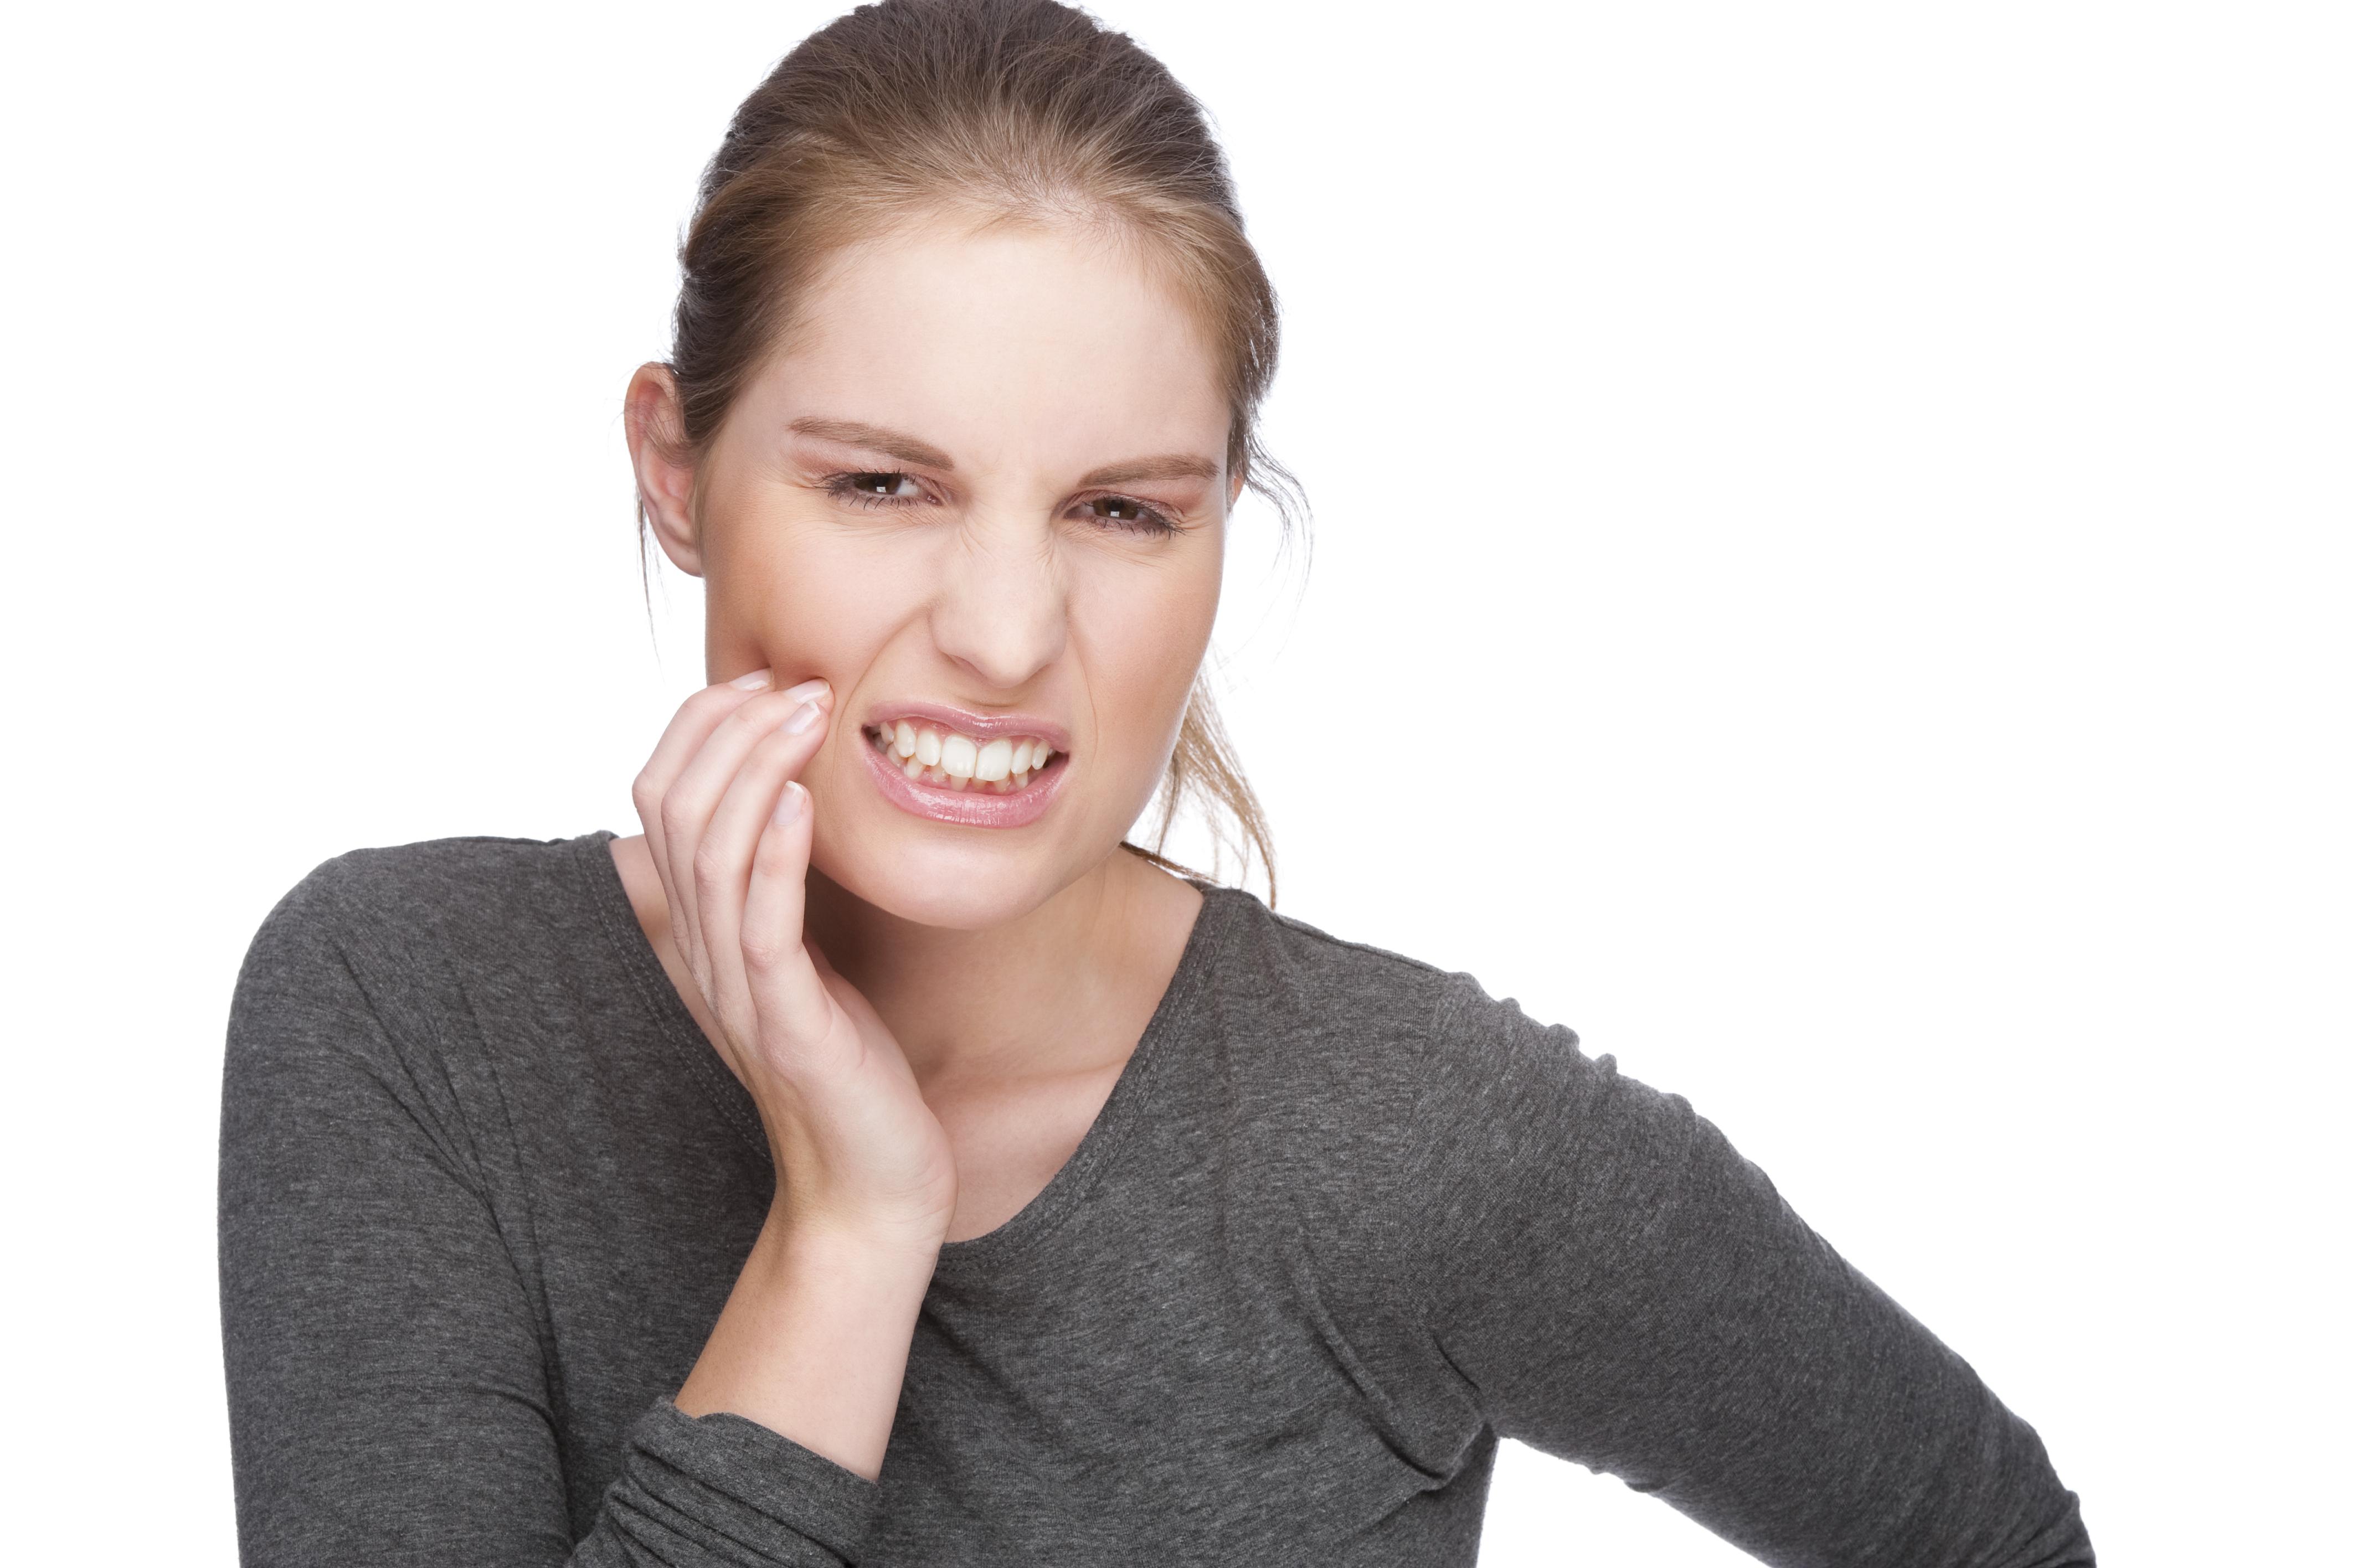 Pautas dietéticas en sensibilidad dental